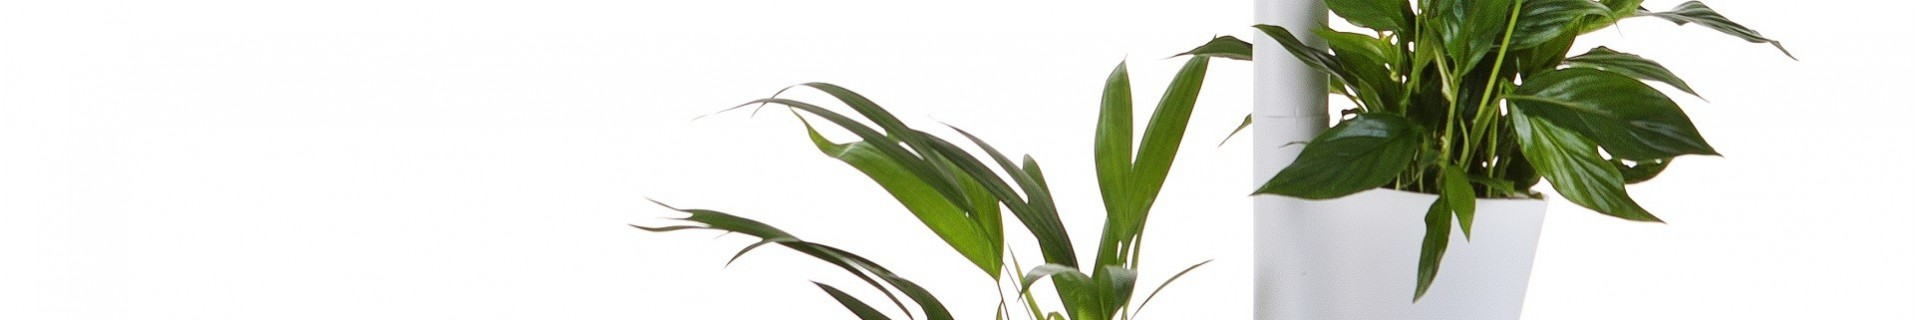 Packs avec plantes